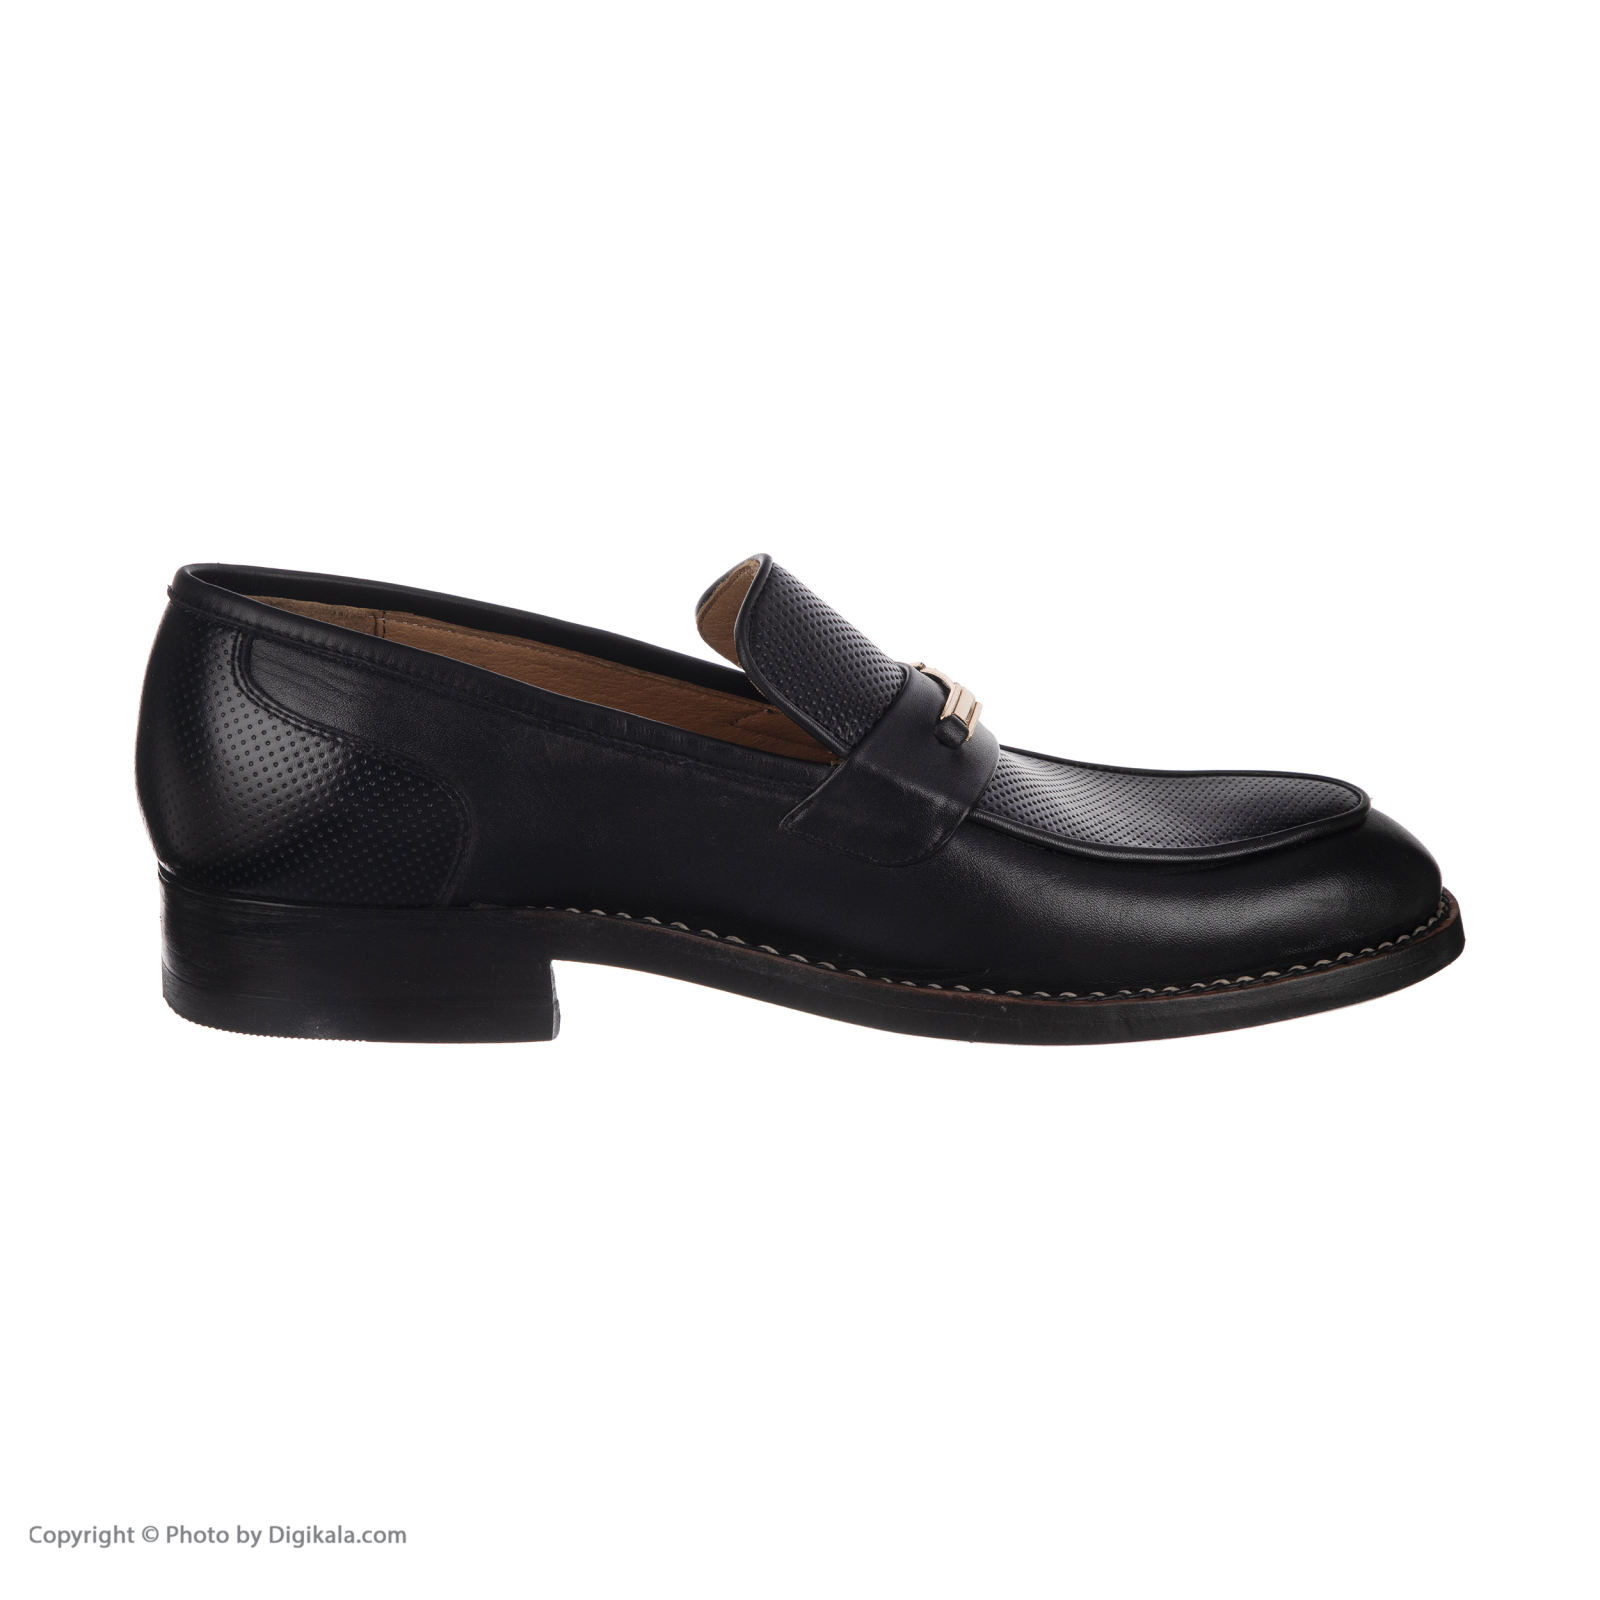 کفش مردانه نظری کد 403 -  - 2